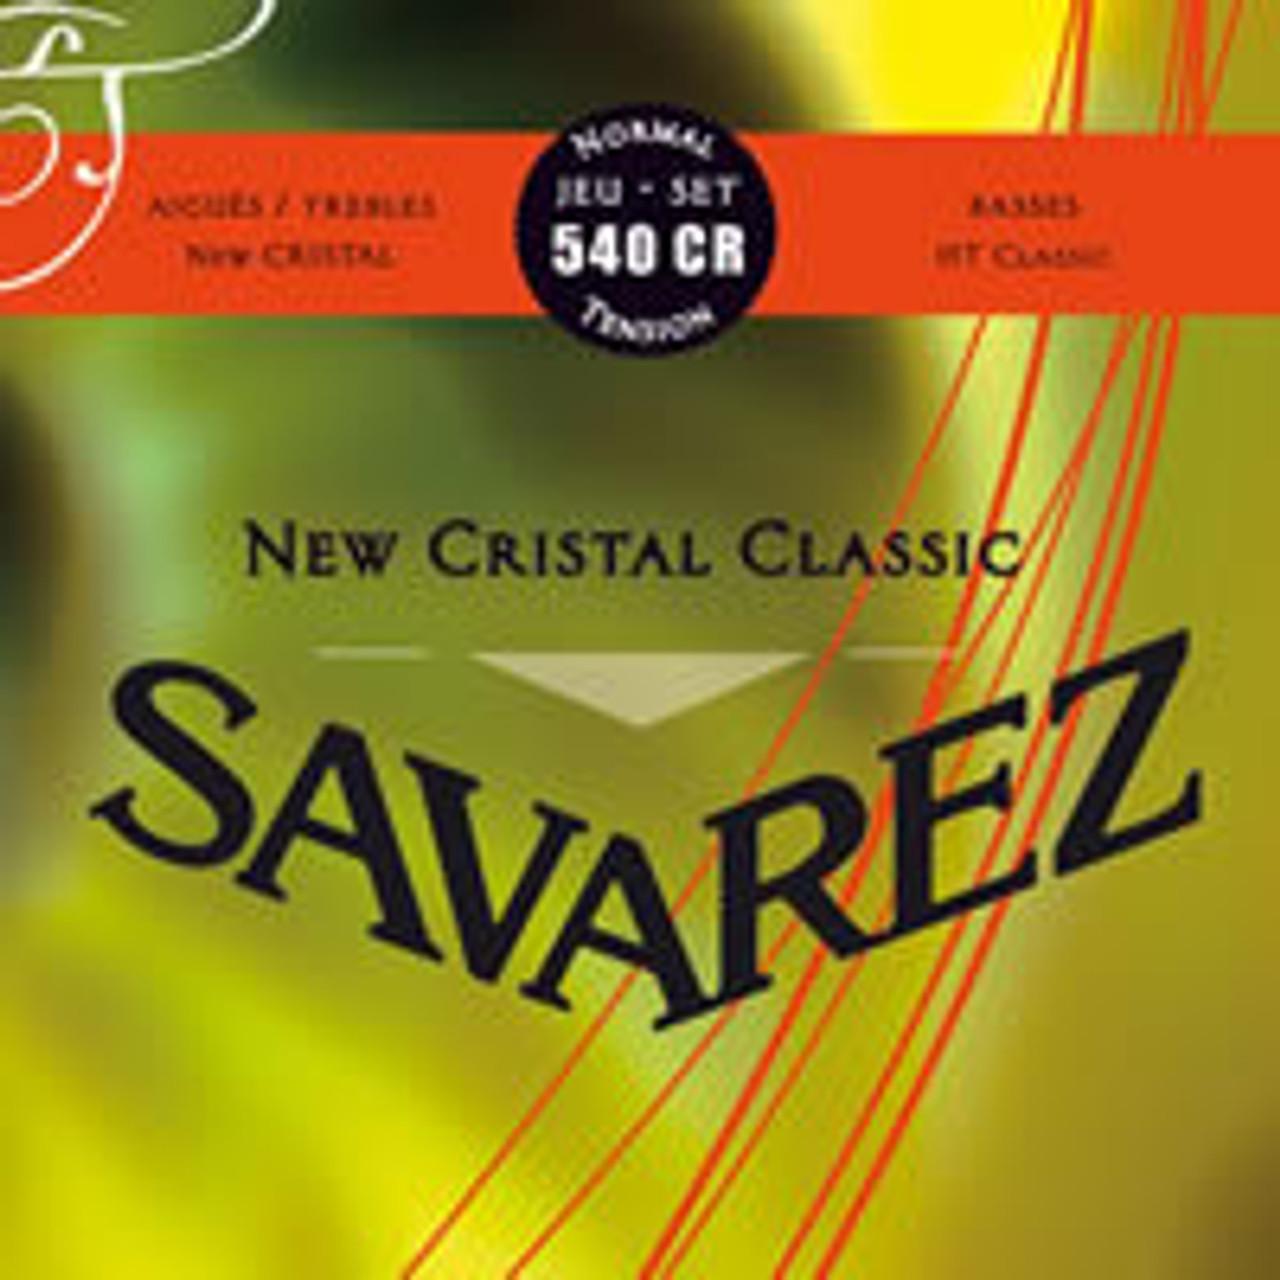 Savarez New Cristal Classic Guitar Strings